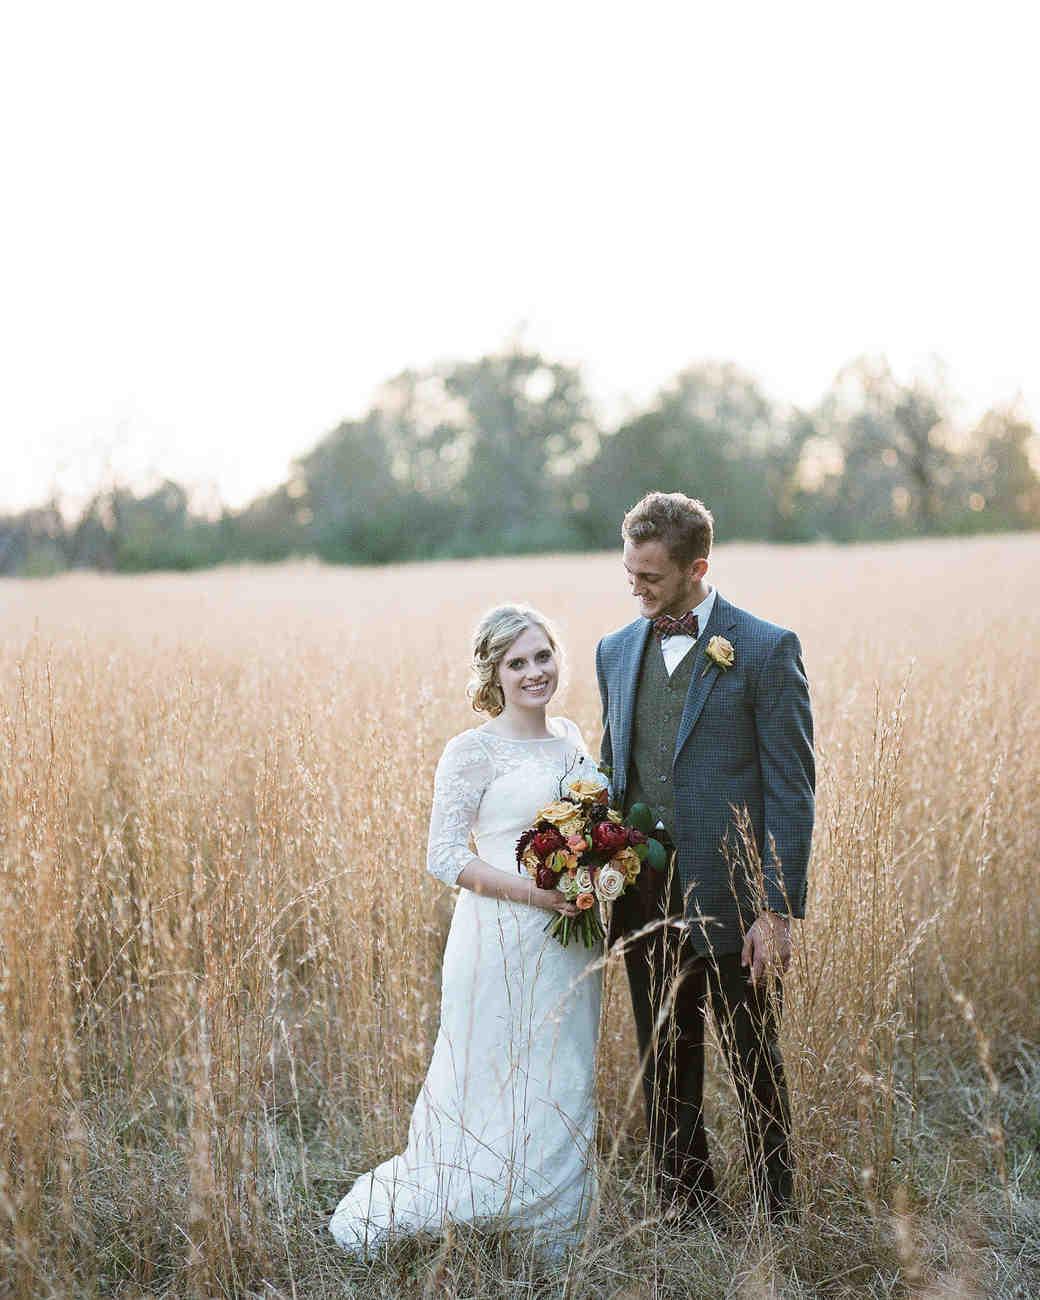 katie-nathan-wedding-thanksgiving-couple-371-s113017.jpg